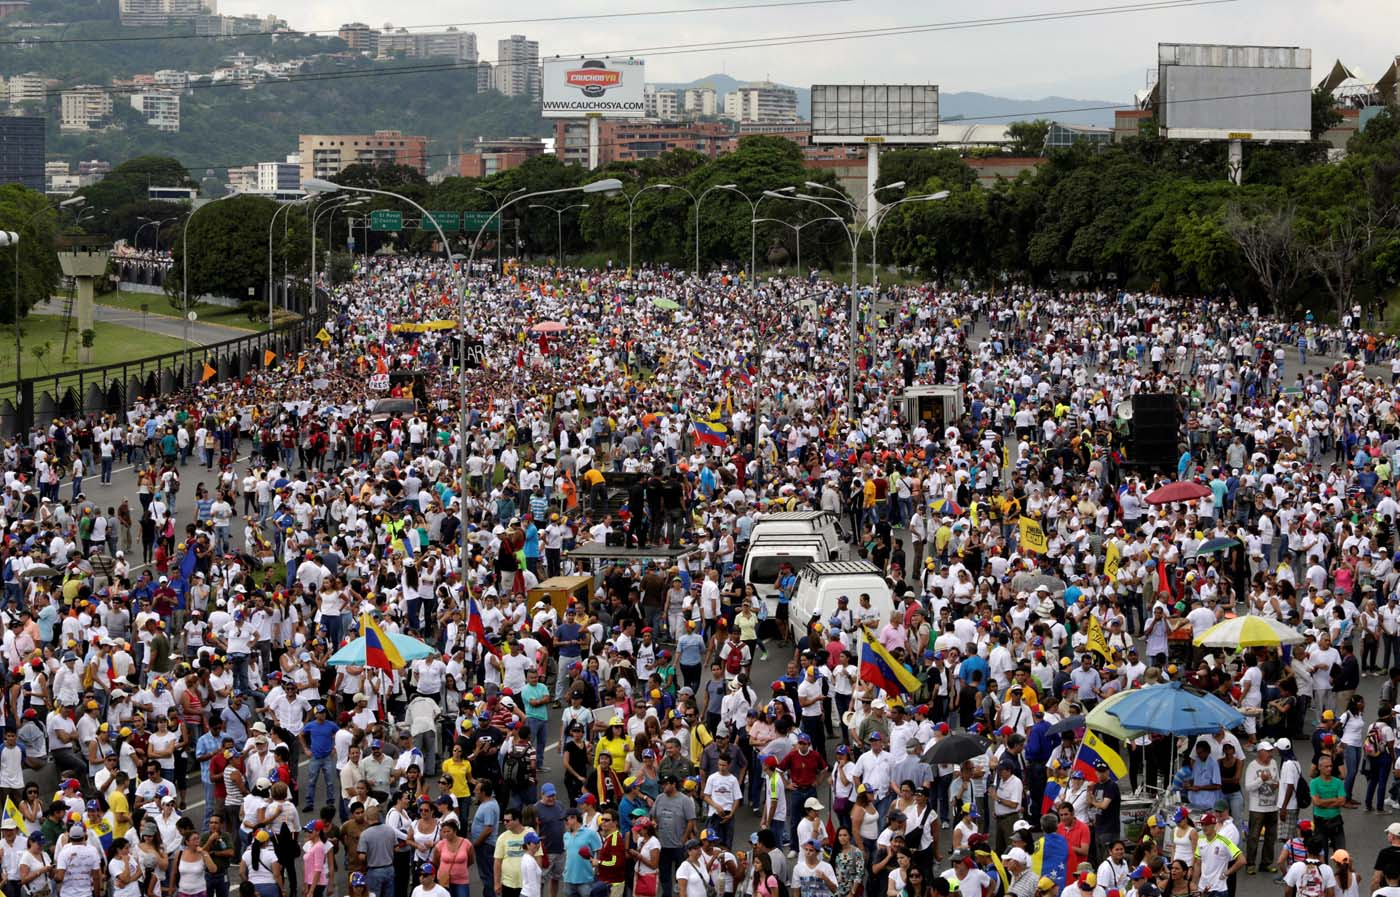 2016-10-26T164243Z_1609132487_S1AEUJFNDJAA_RTRMADP_3_VENEZUELA-POLITICS